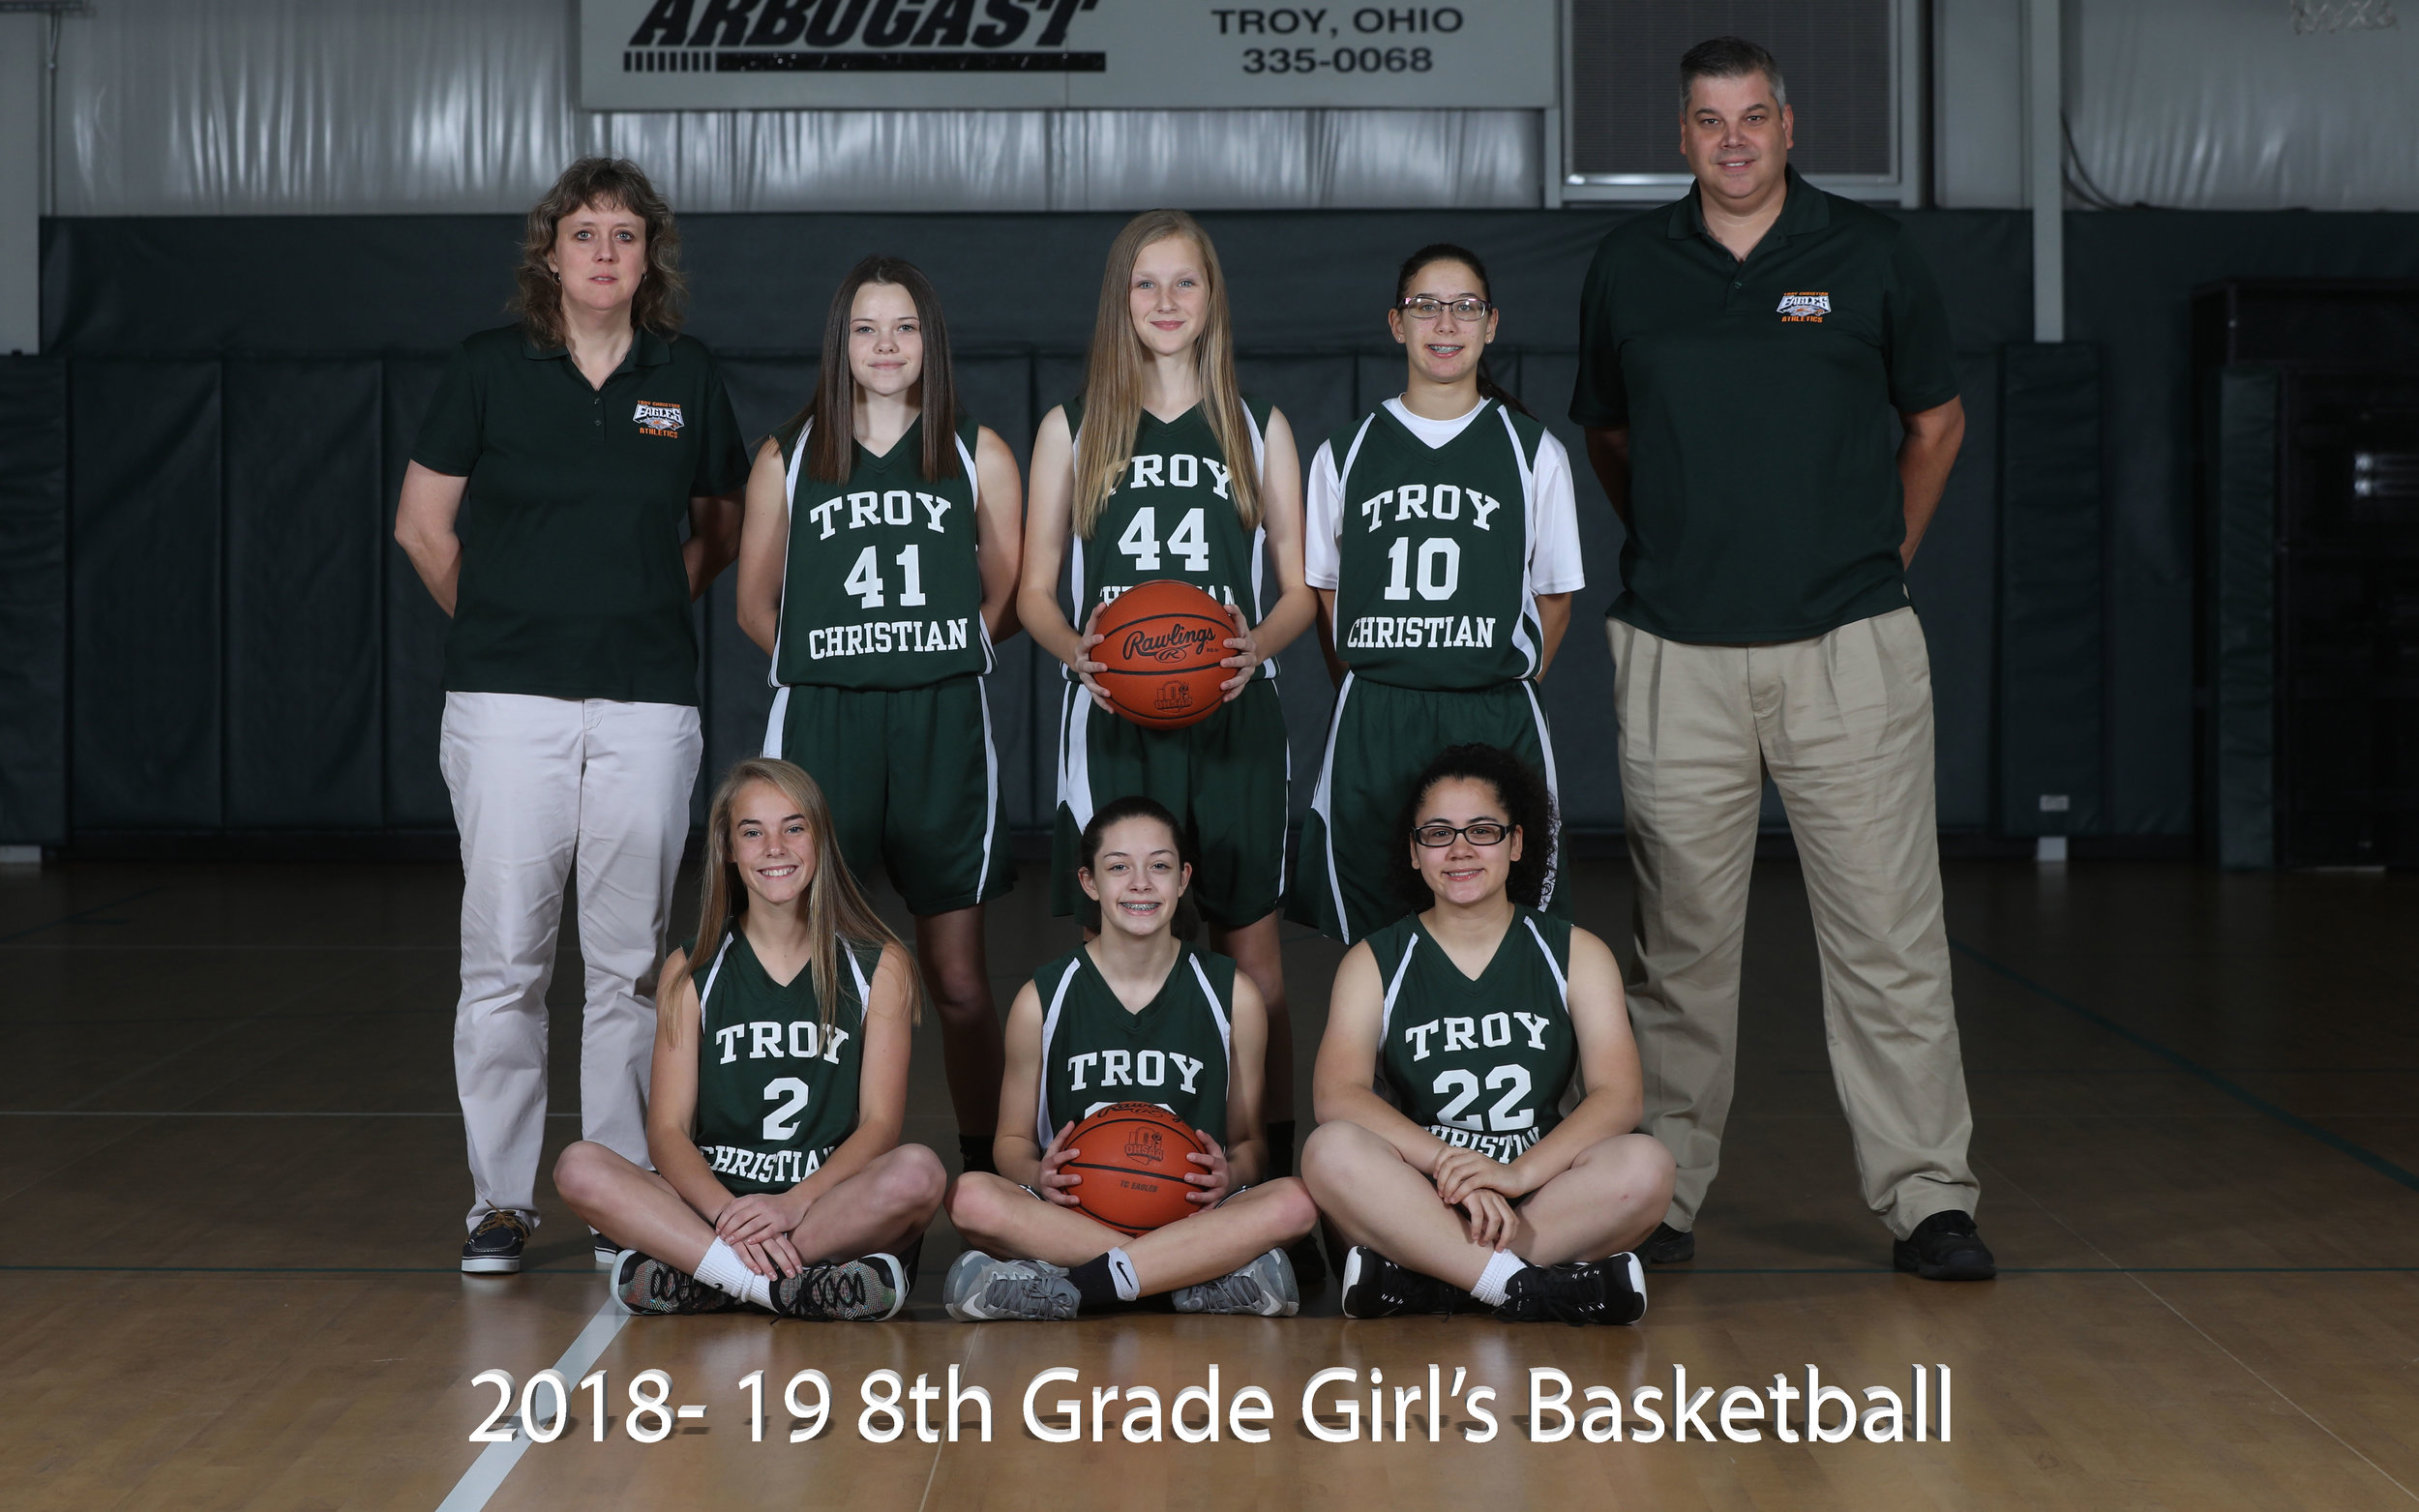 2017-18 8th Grade Girl's Basketball